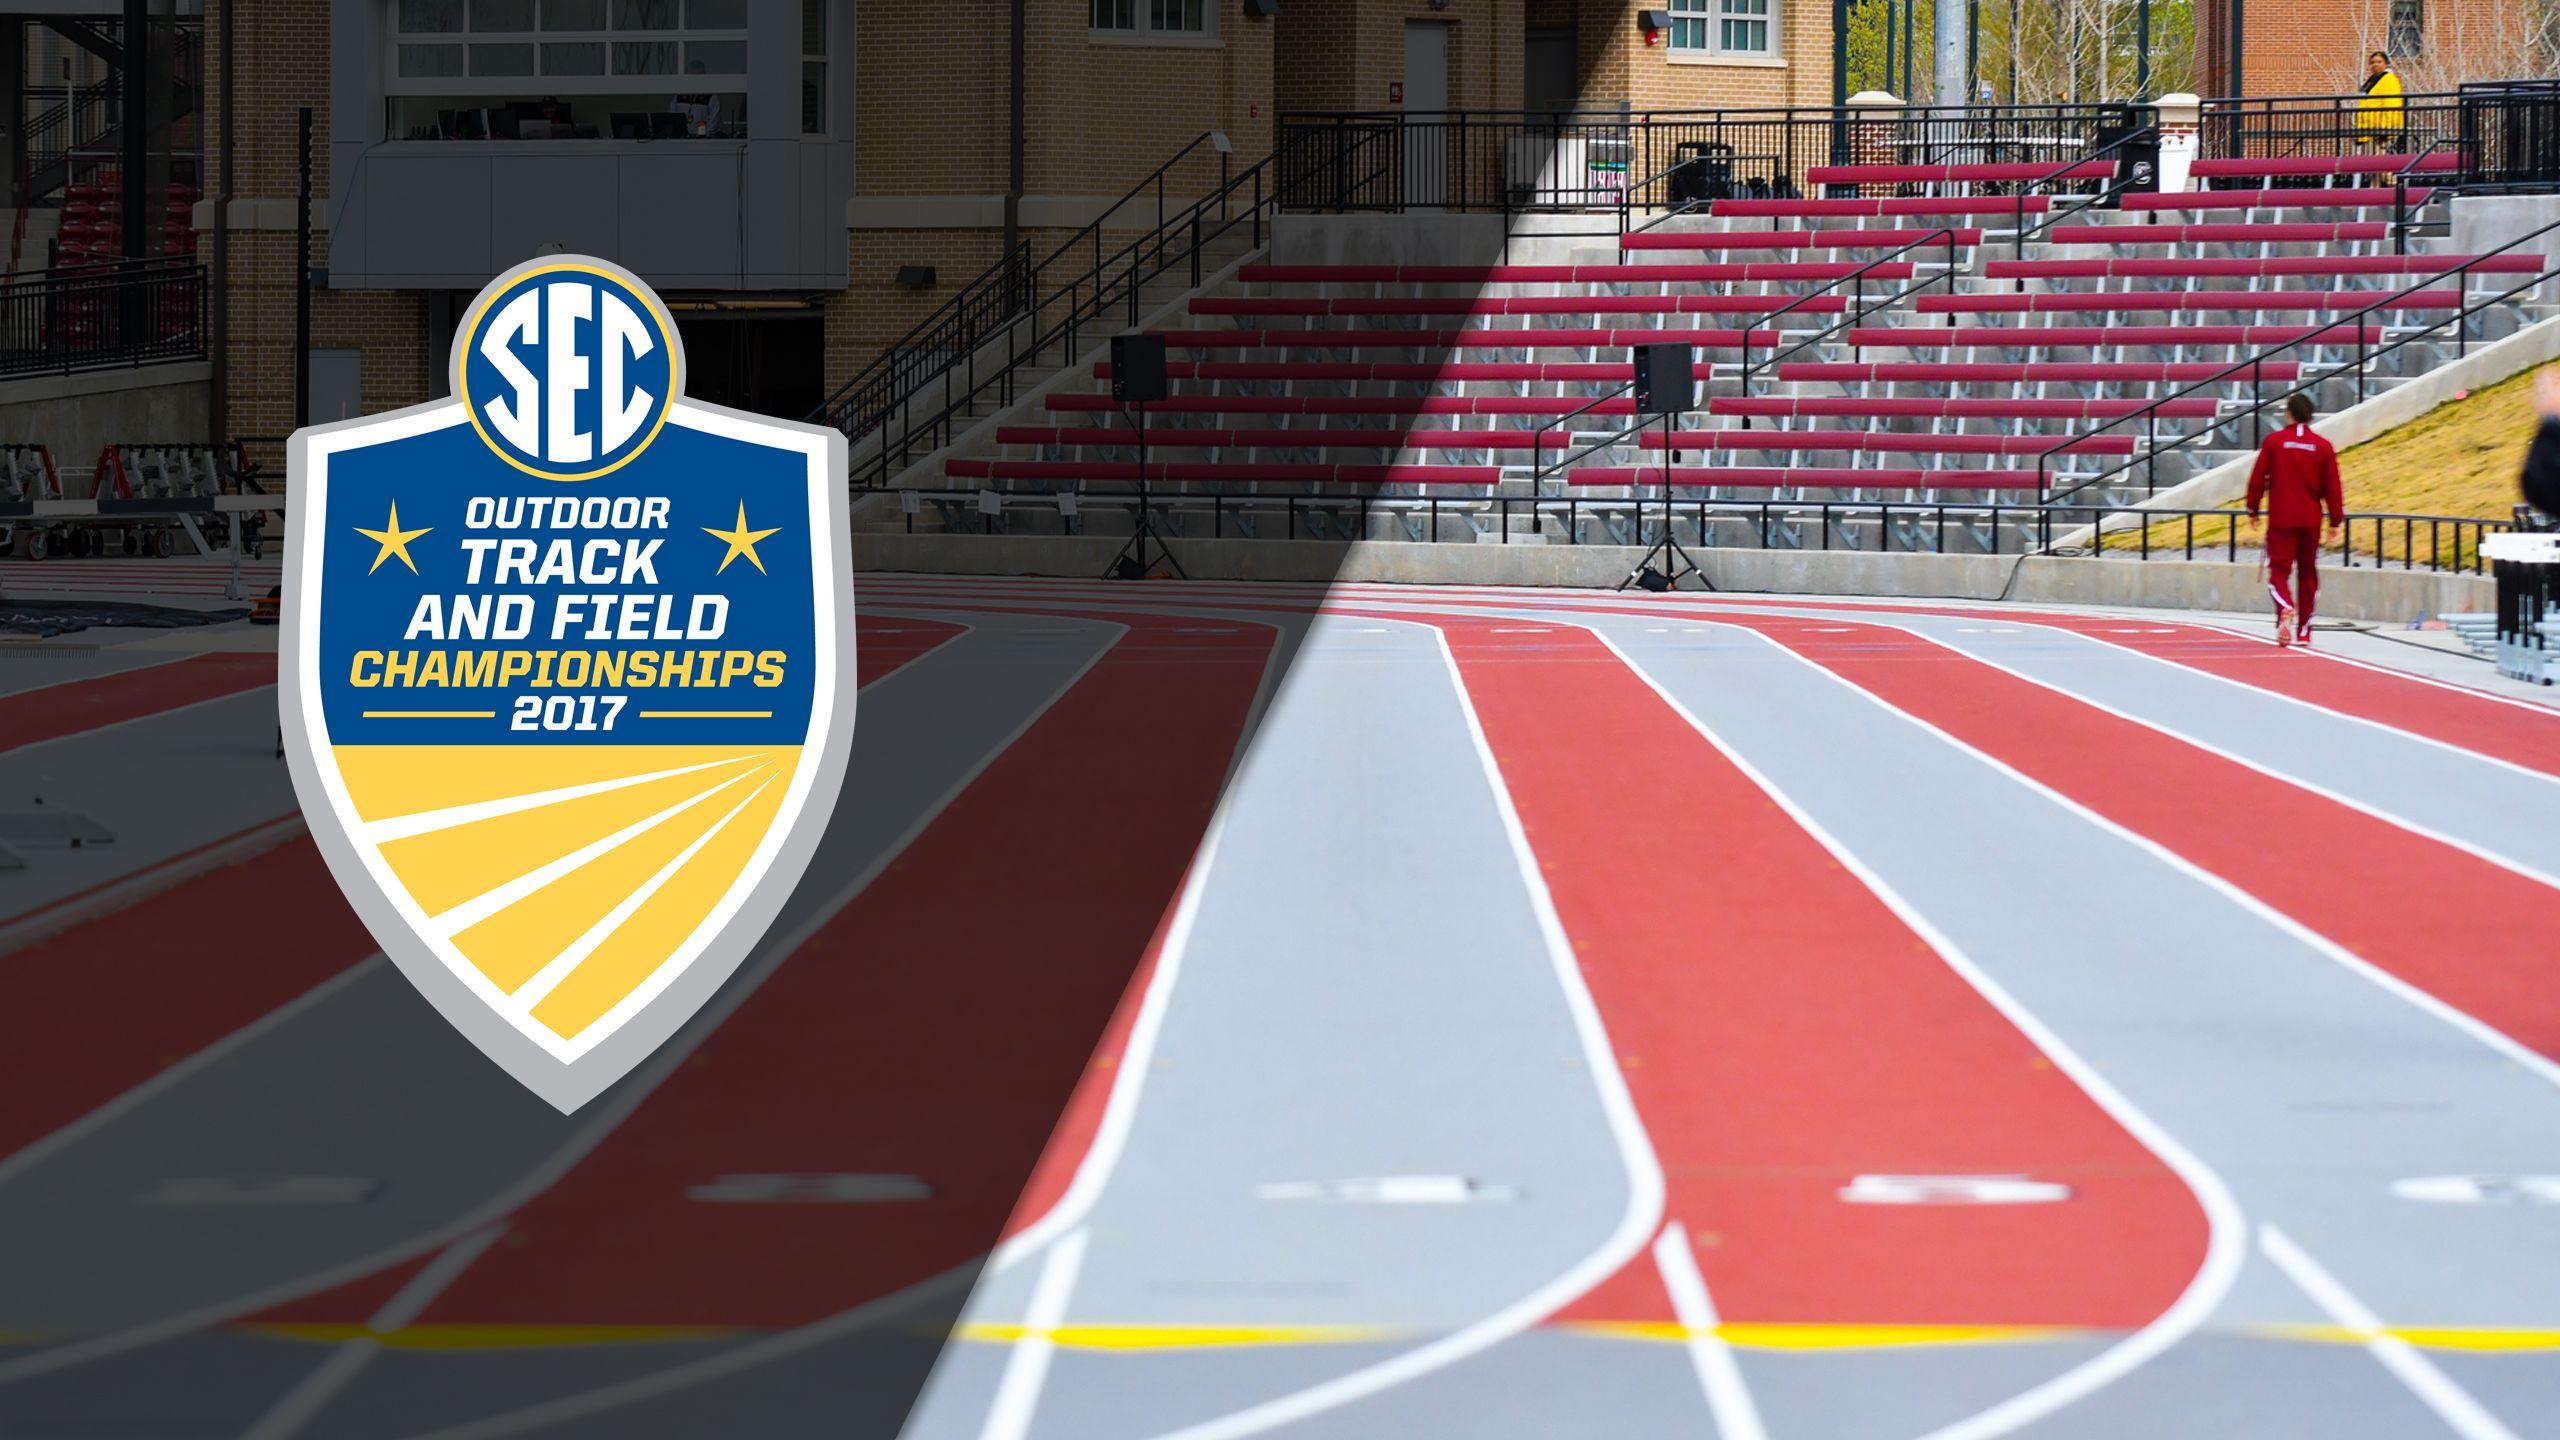 2017 SEC Outdoor Track & Field Championship